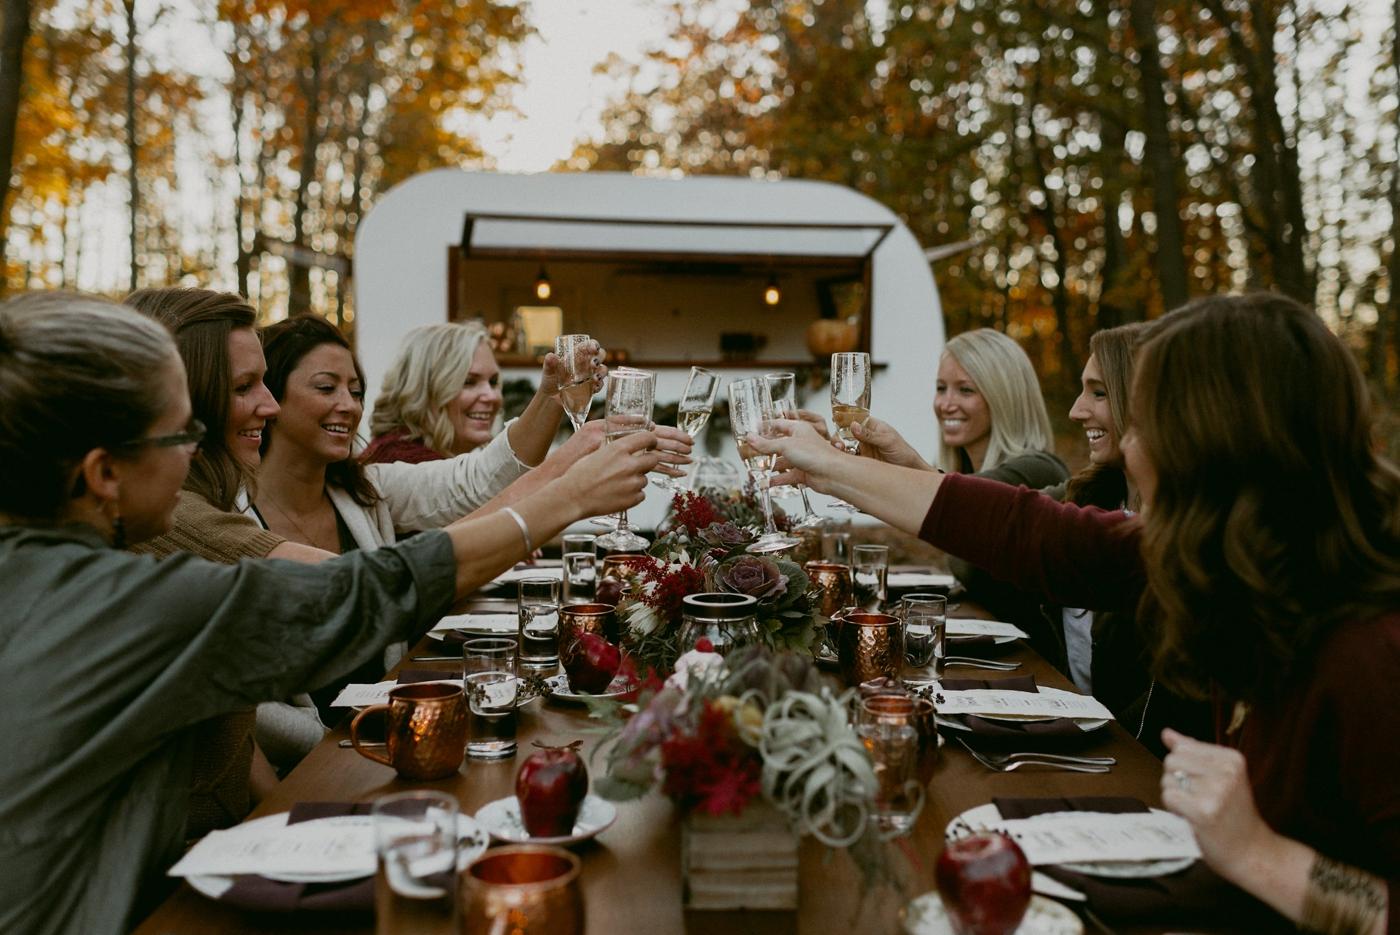 Autumn-Bridal-Shower-Vintage-Caravan-Styled-Shoot_MJPHOTO-95.jpg